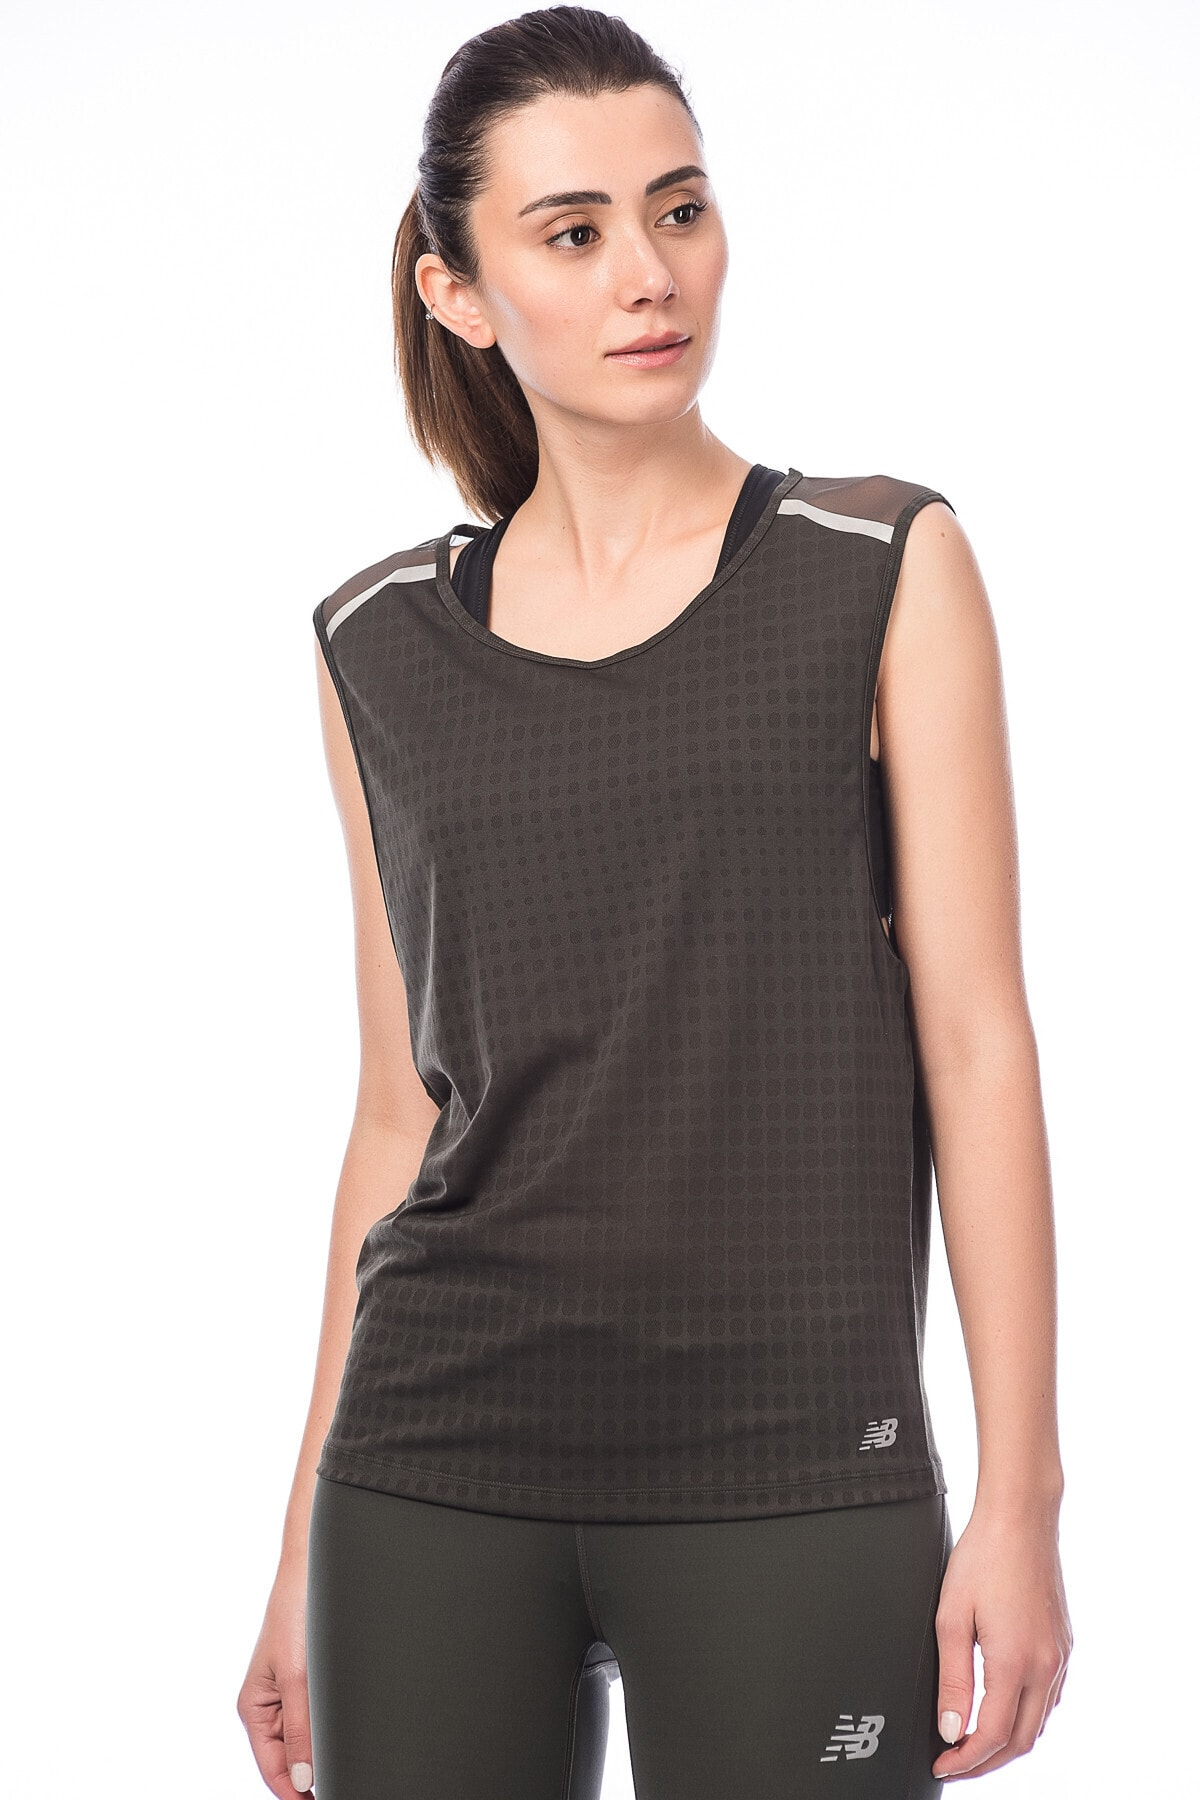 New Balance WT71209 Kadın Yeşil T-Shirt - WT71209-FCG 2